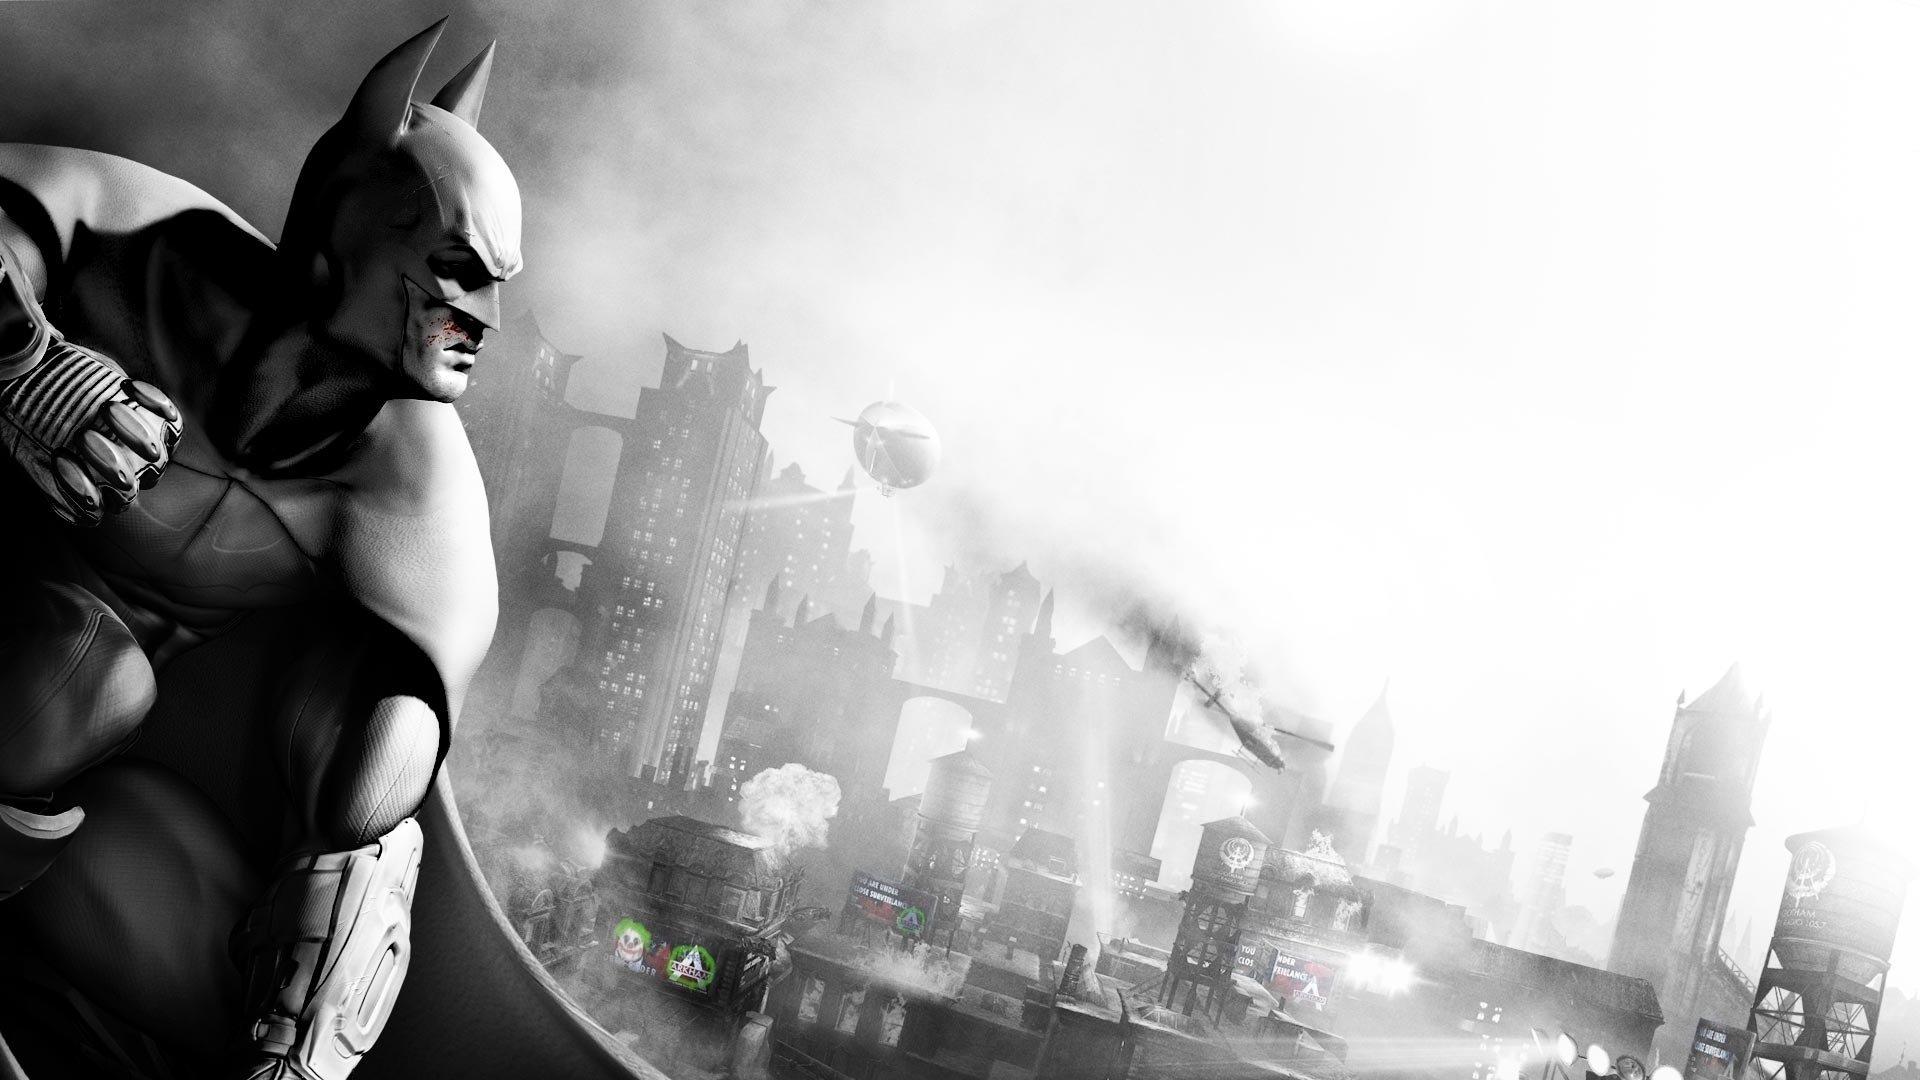 High Resolution Batman Arkham City Full Hd 1080p Wallpaper Id